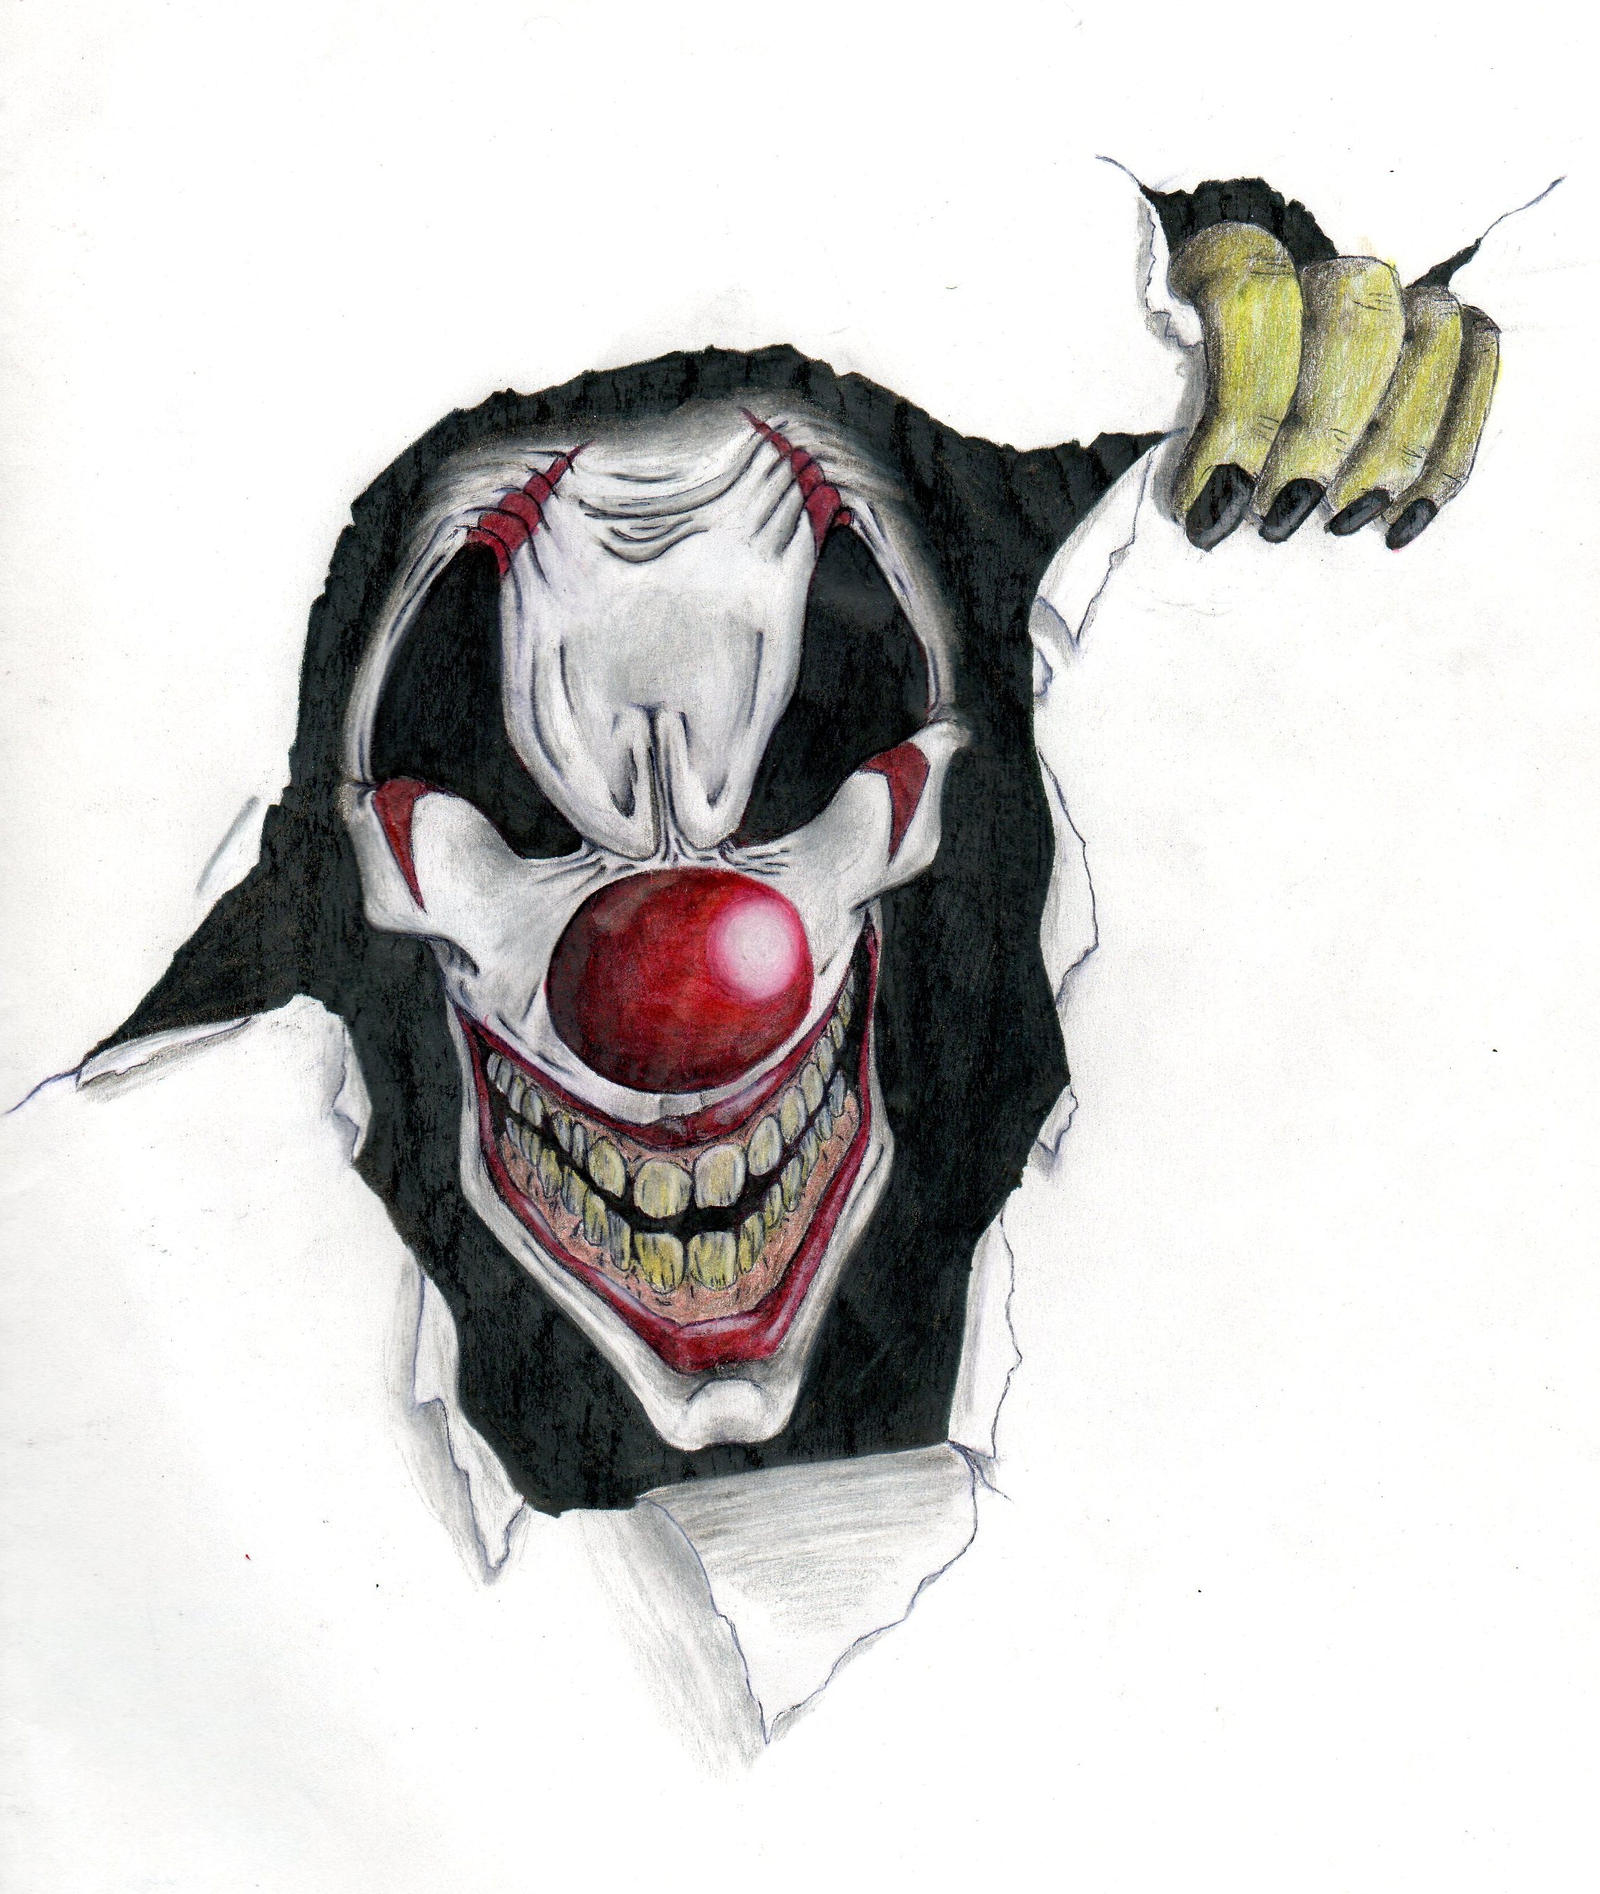 Evil clown 2 by exau on DeviantArt